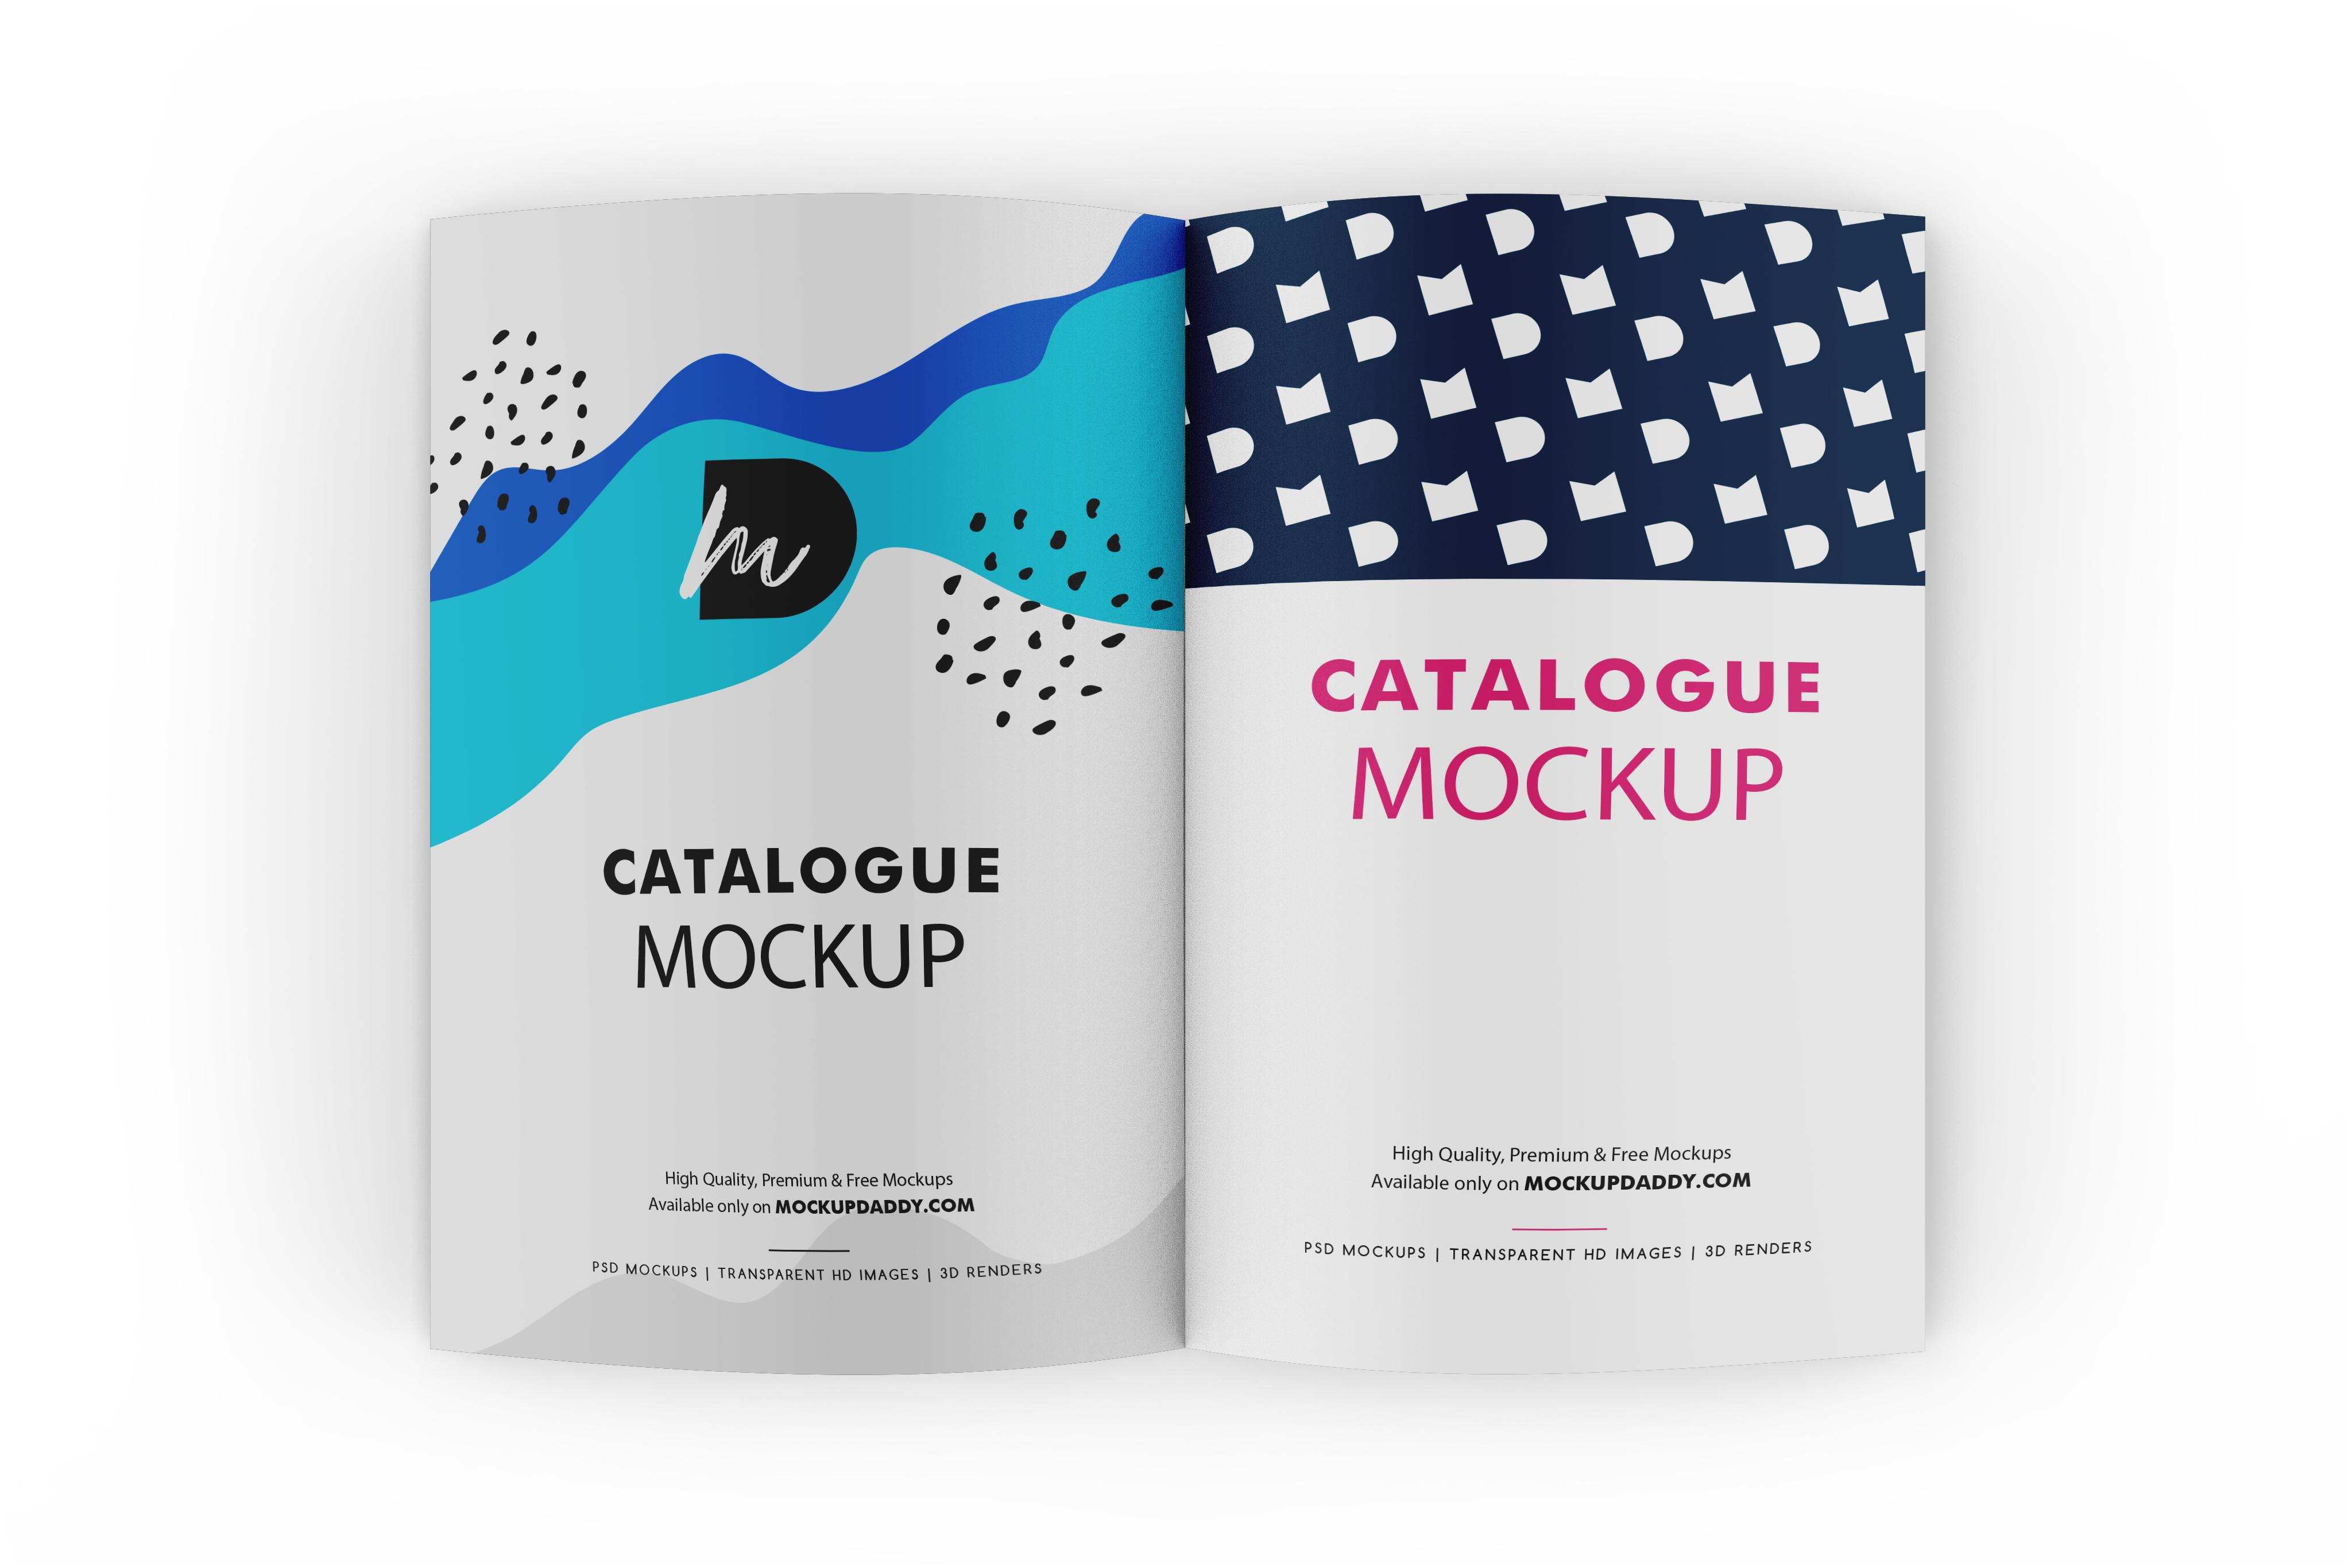 Catalogue Psd Mockup Free Download - Premium Branding Mockups